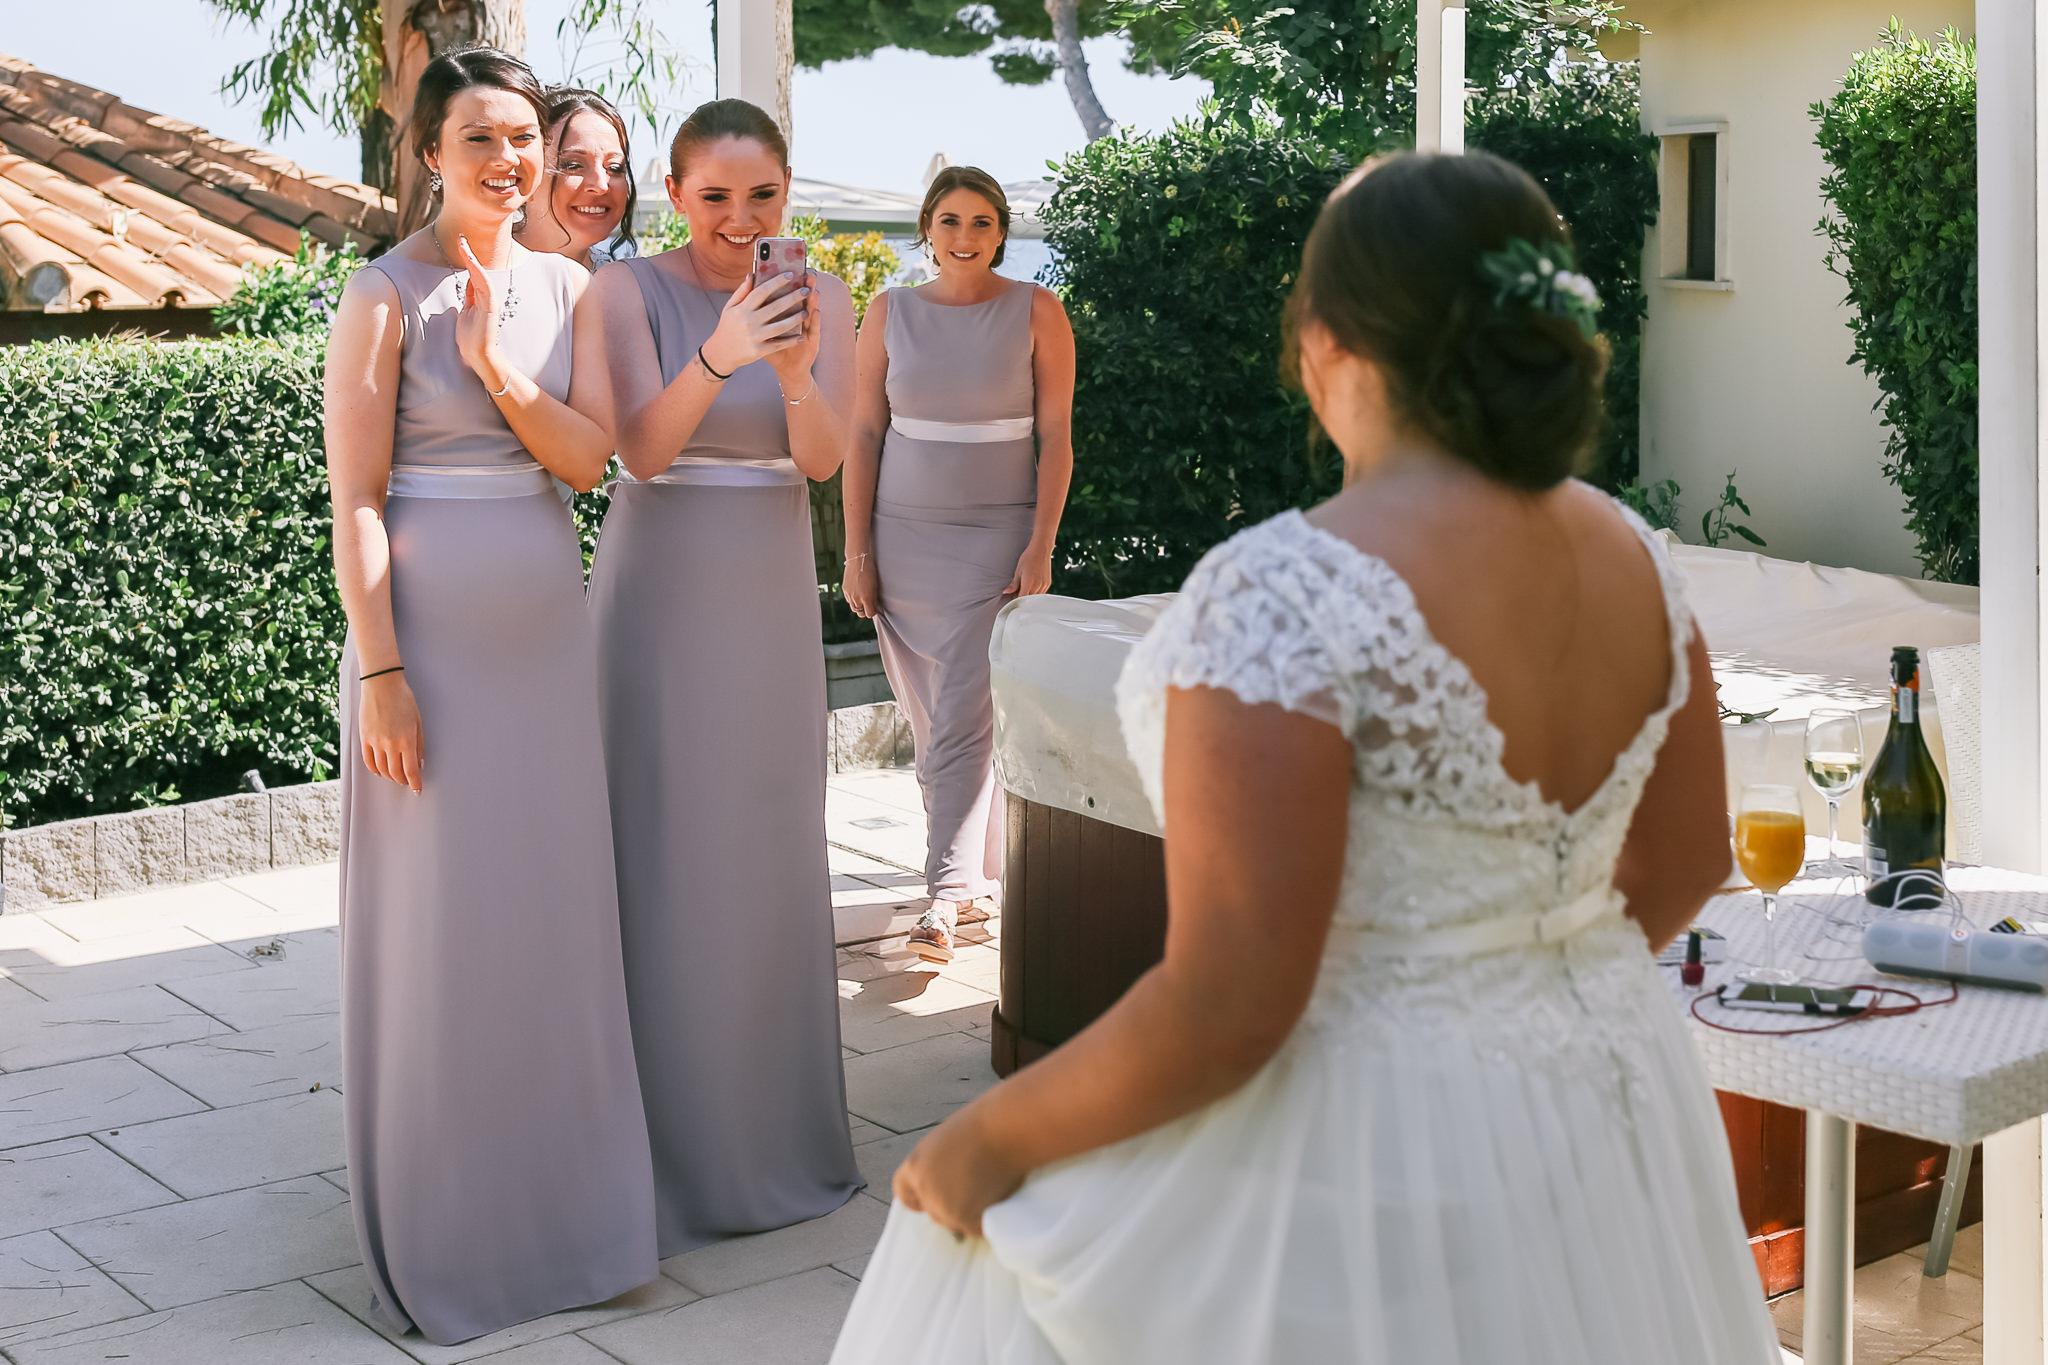 028-2019-04-27-Wedding-Michelle-e-Callum-35mm-065-Edit